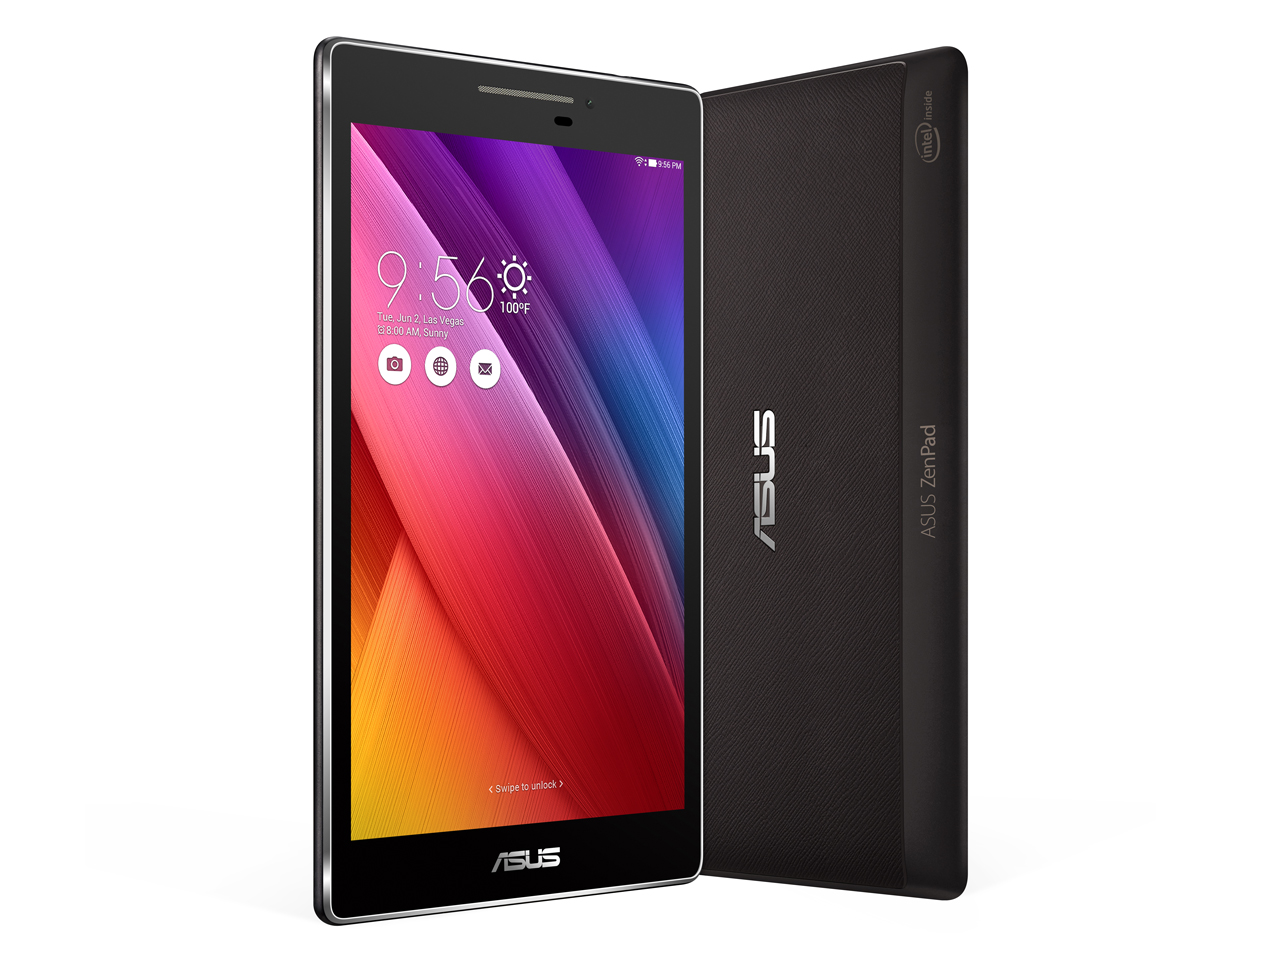 ASUS ZenPad 7.0 Z370C-BK16 [ブラック] の製品画像